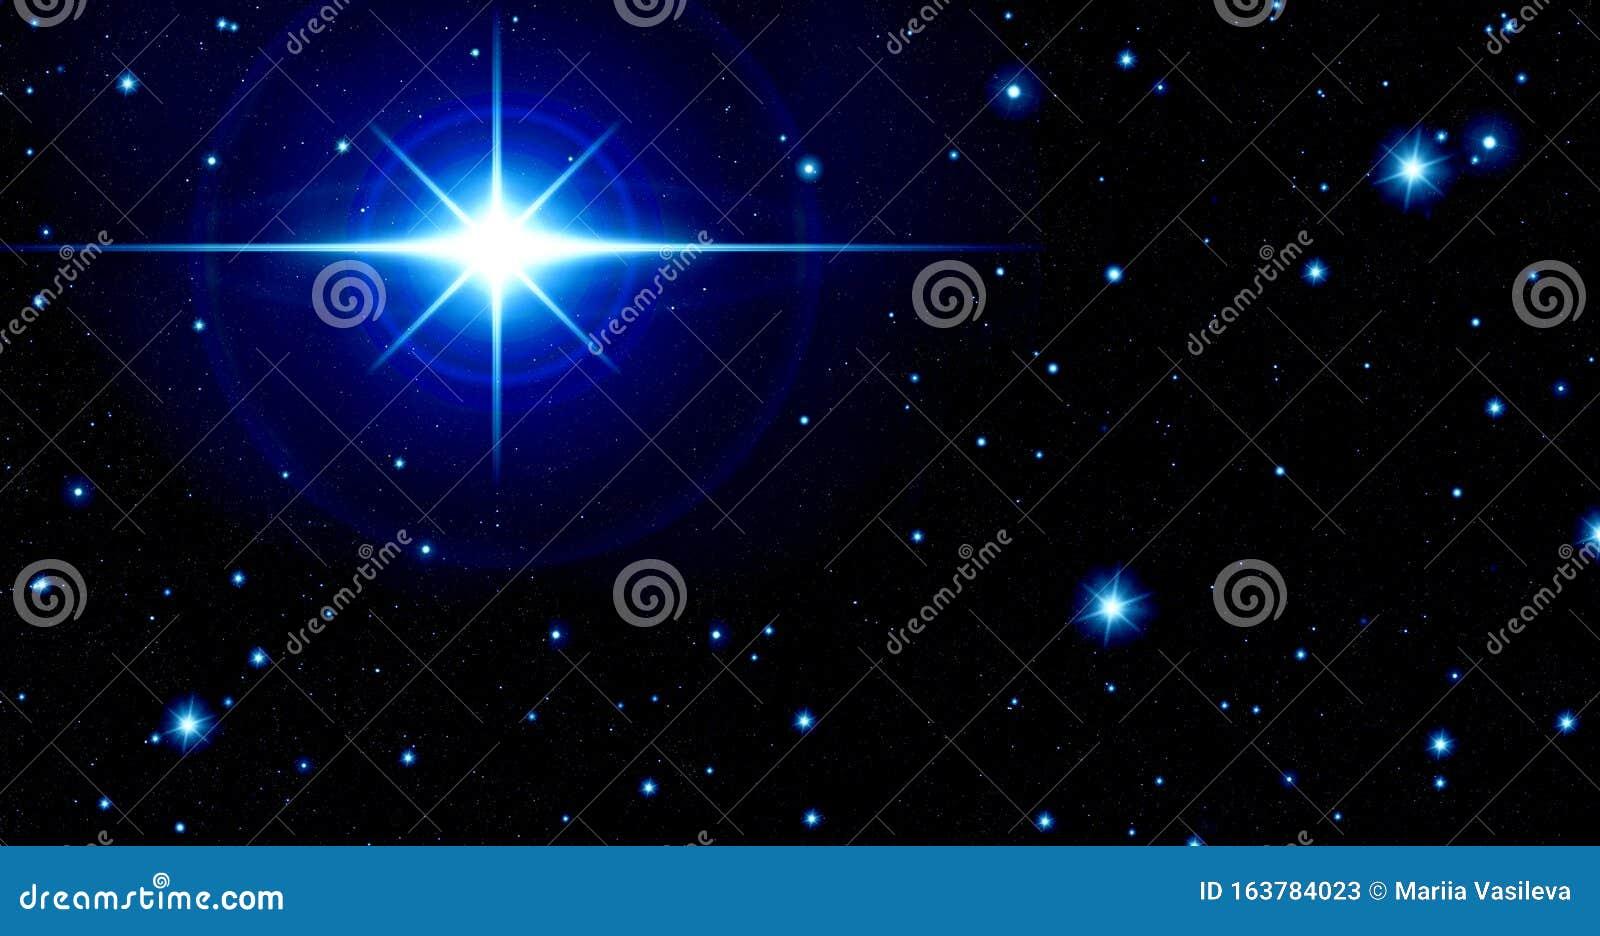 Outer Space Many Stars Glitter Star Bright Blue Star Night Sky Universe Glow Blue Black Stock Illustration Illustration Of Galaxy Blue 163784023